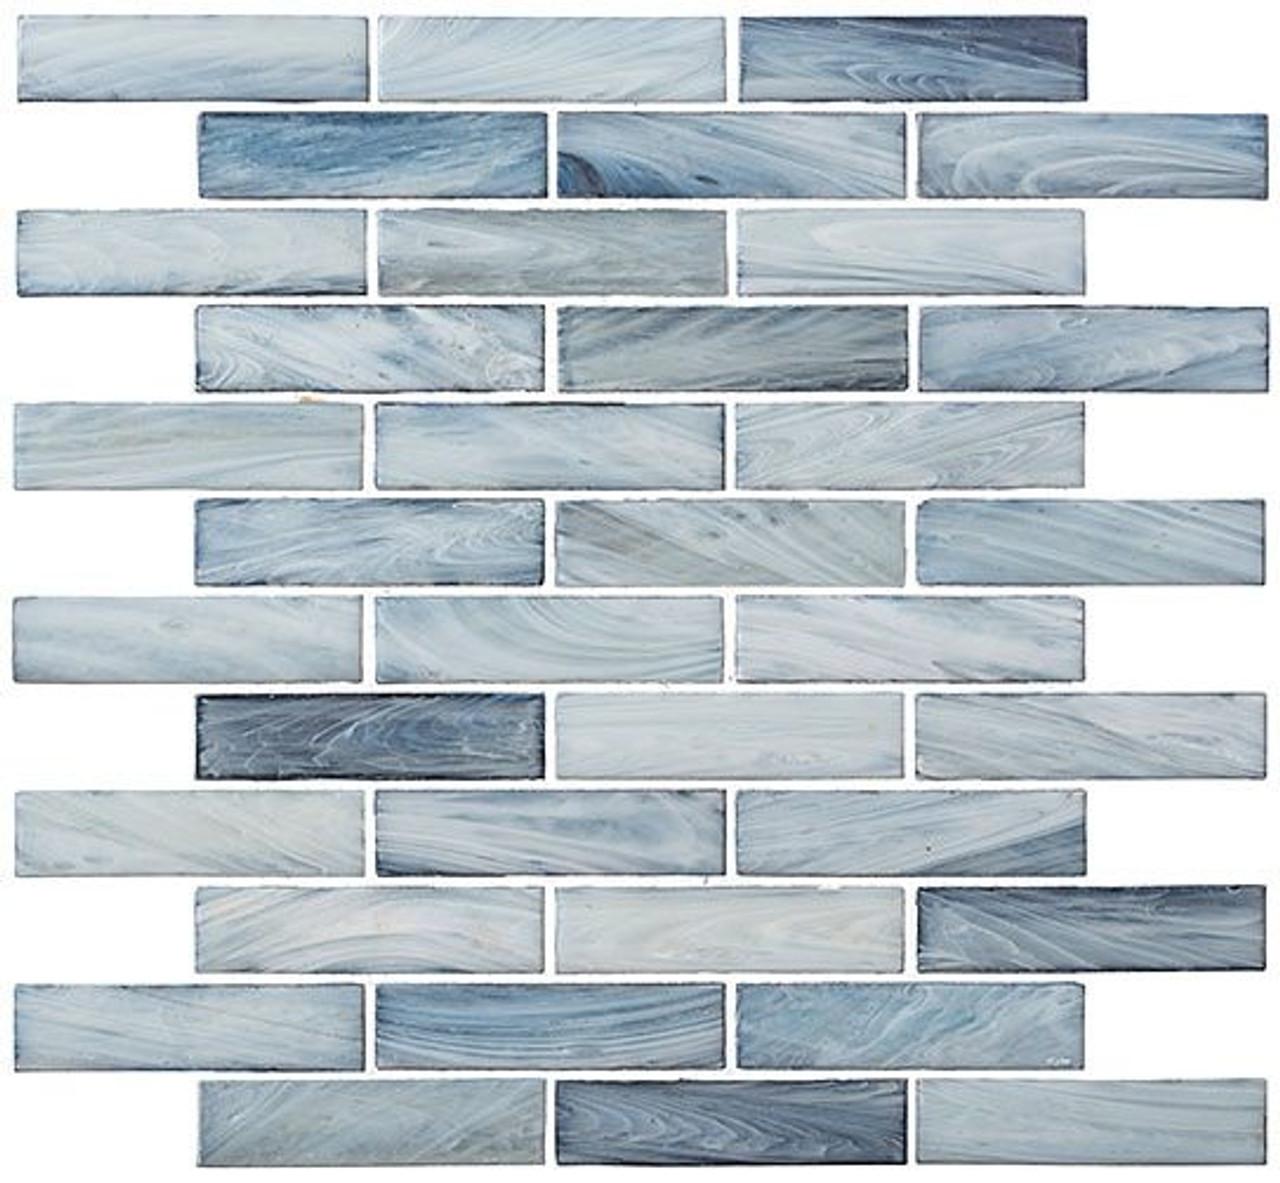 Bella Glass Tiles New England Series Maritime Blue NWG-793